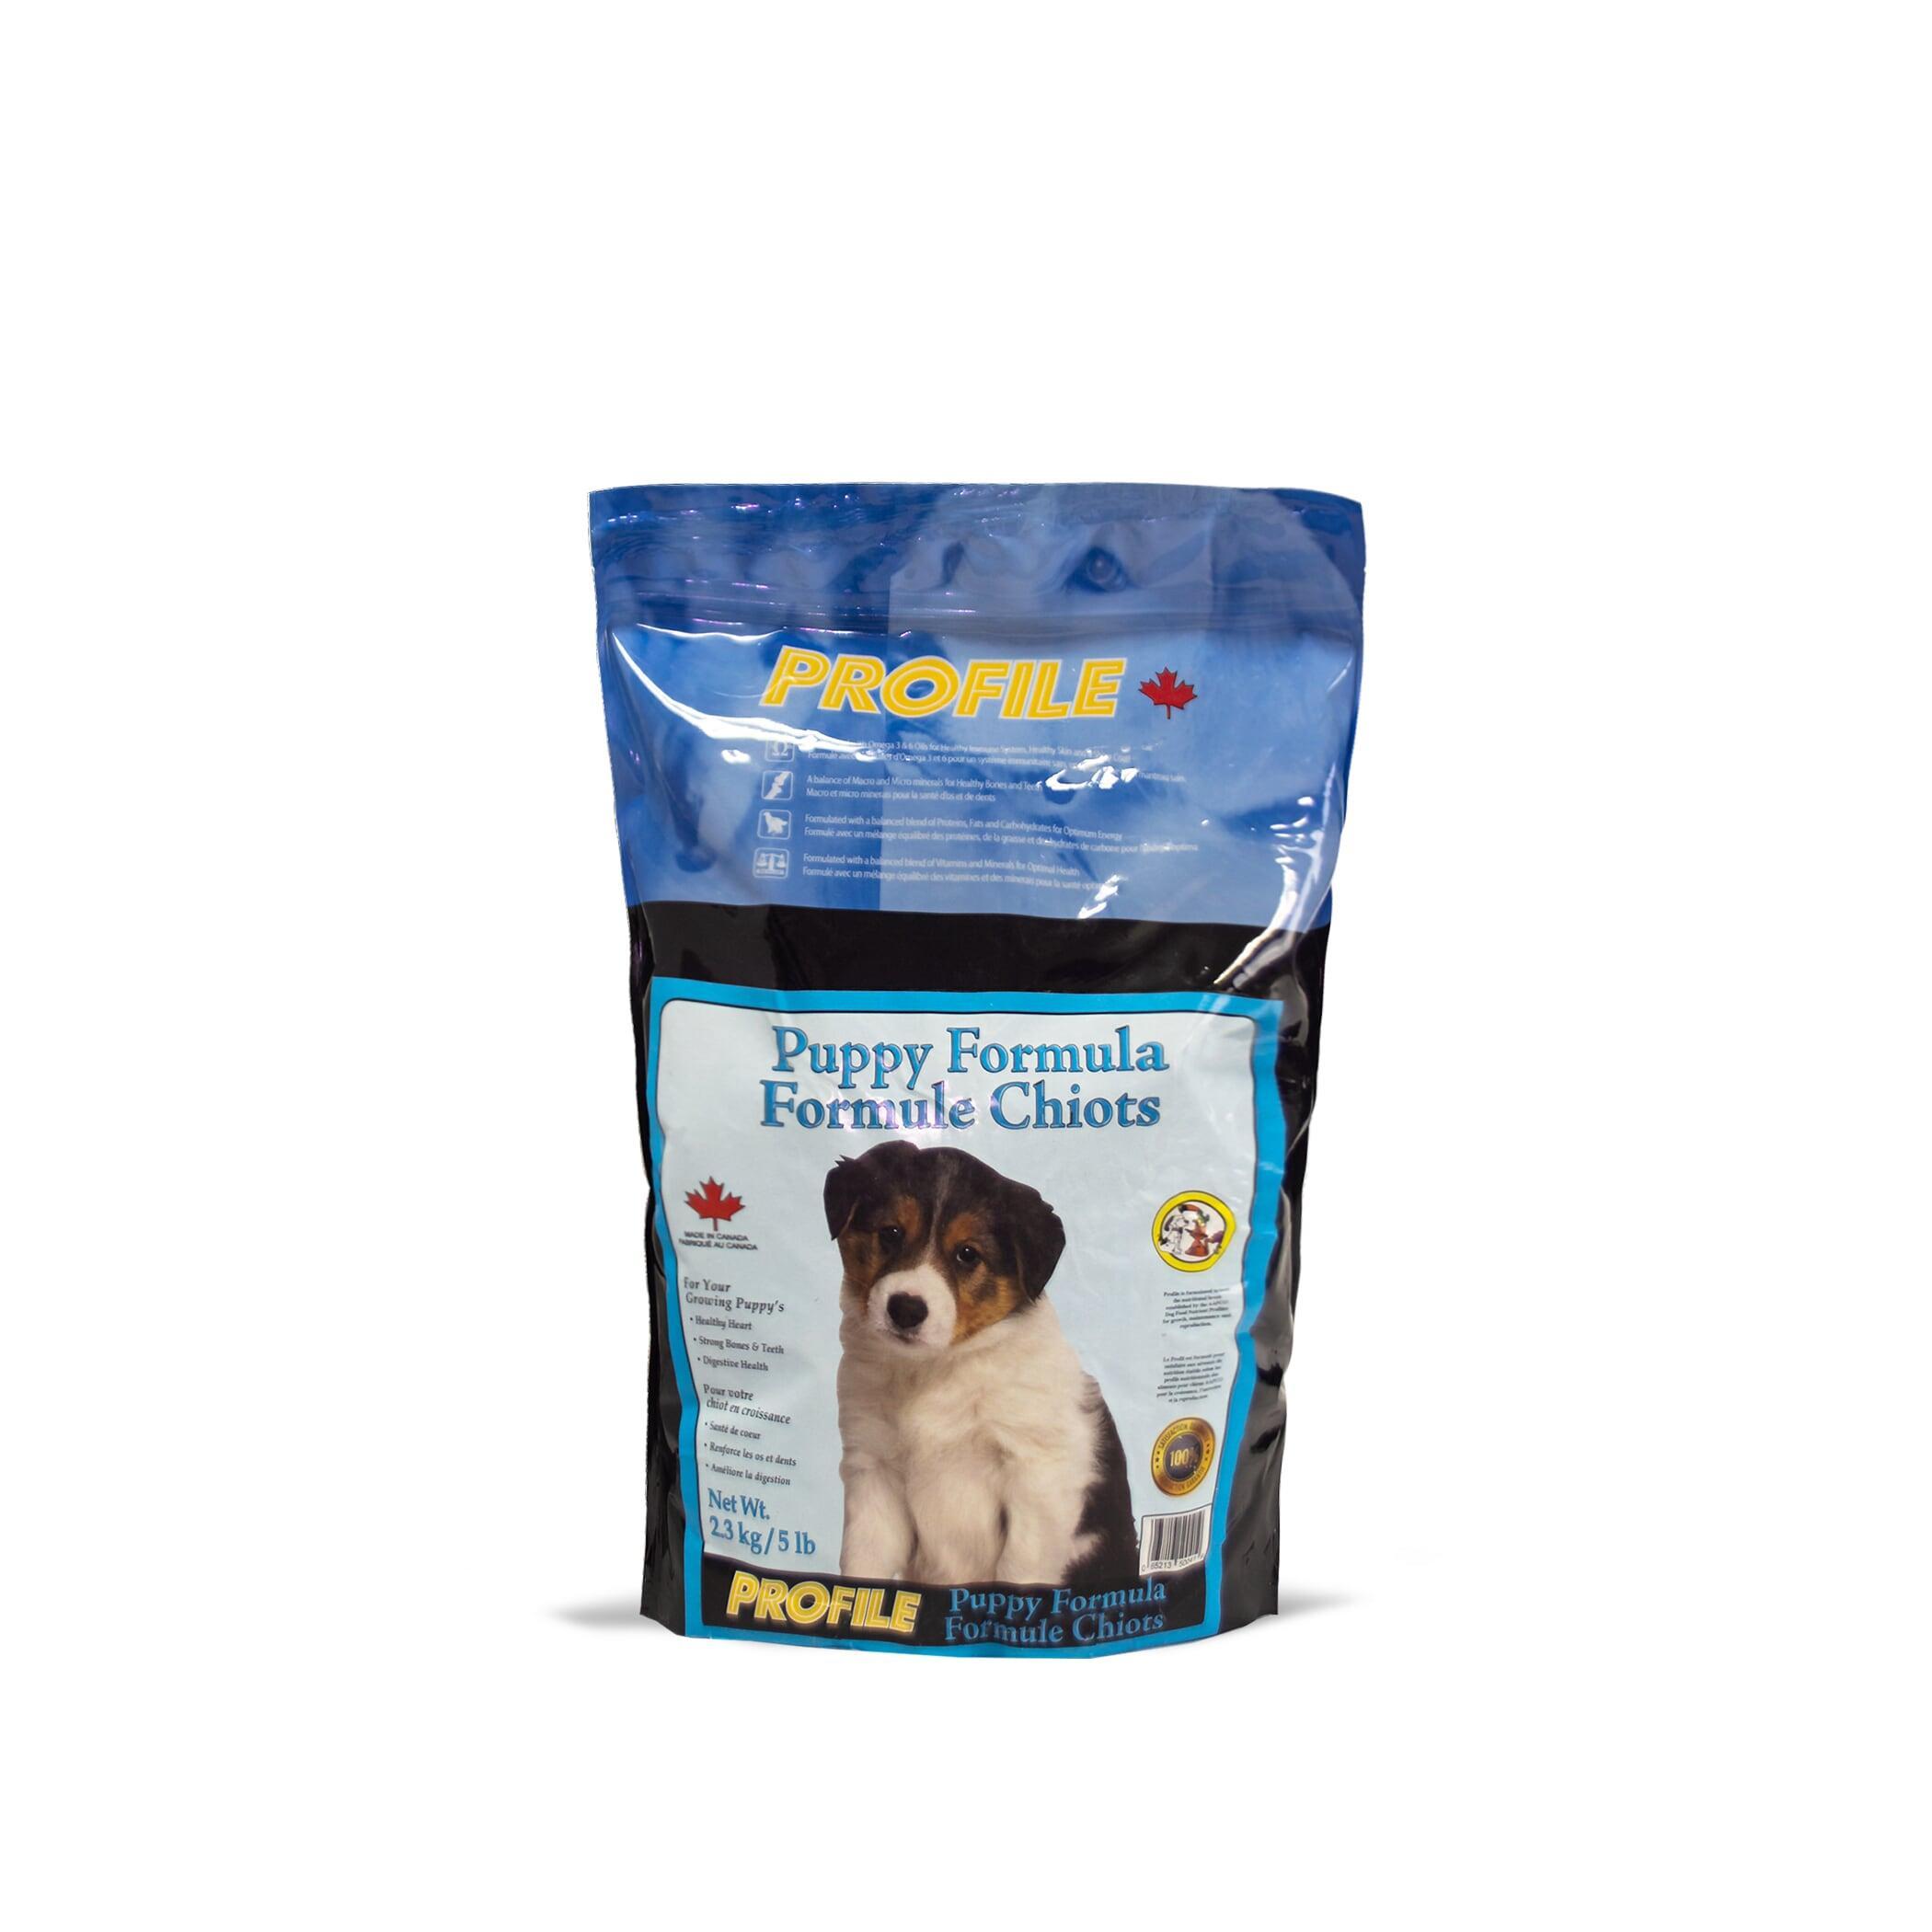 Profile Puppy Dry Dog Food Image